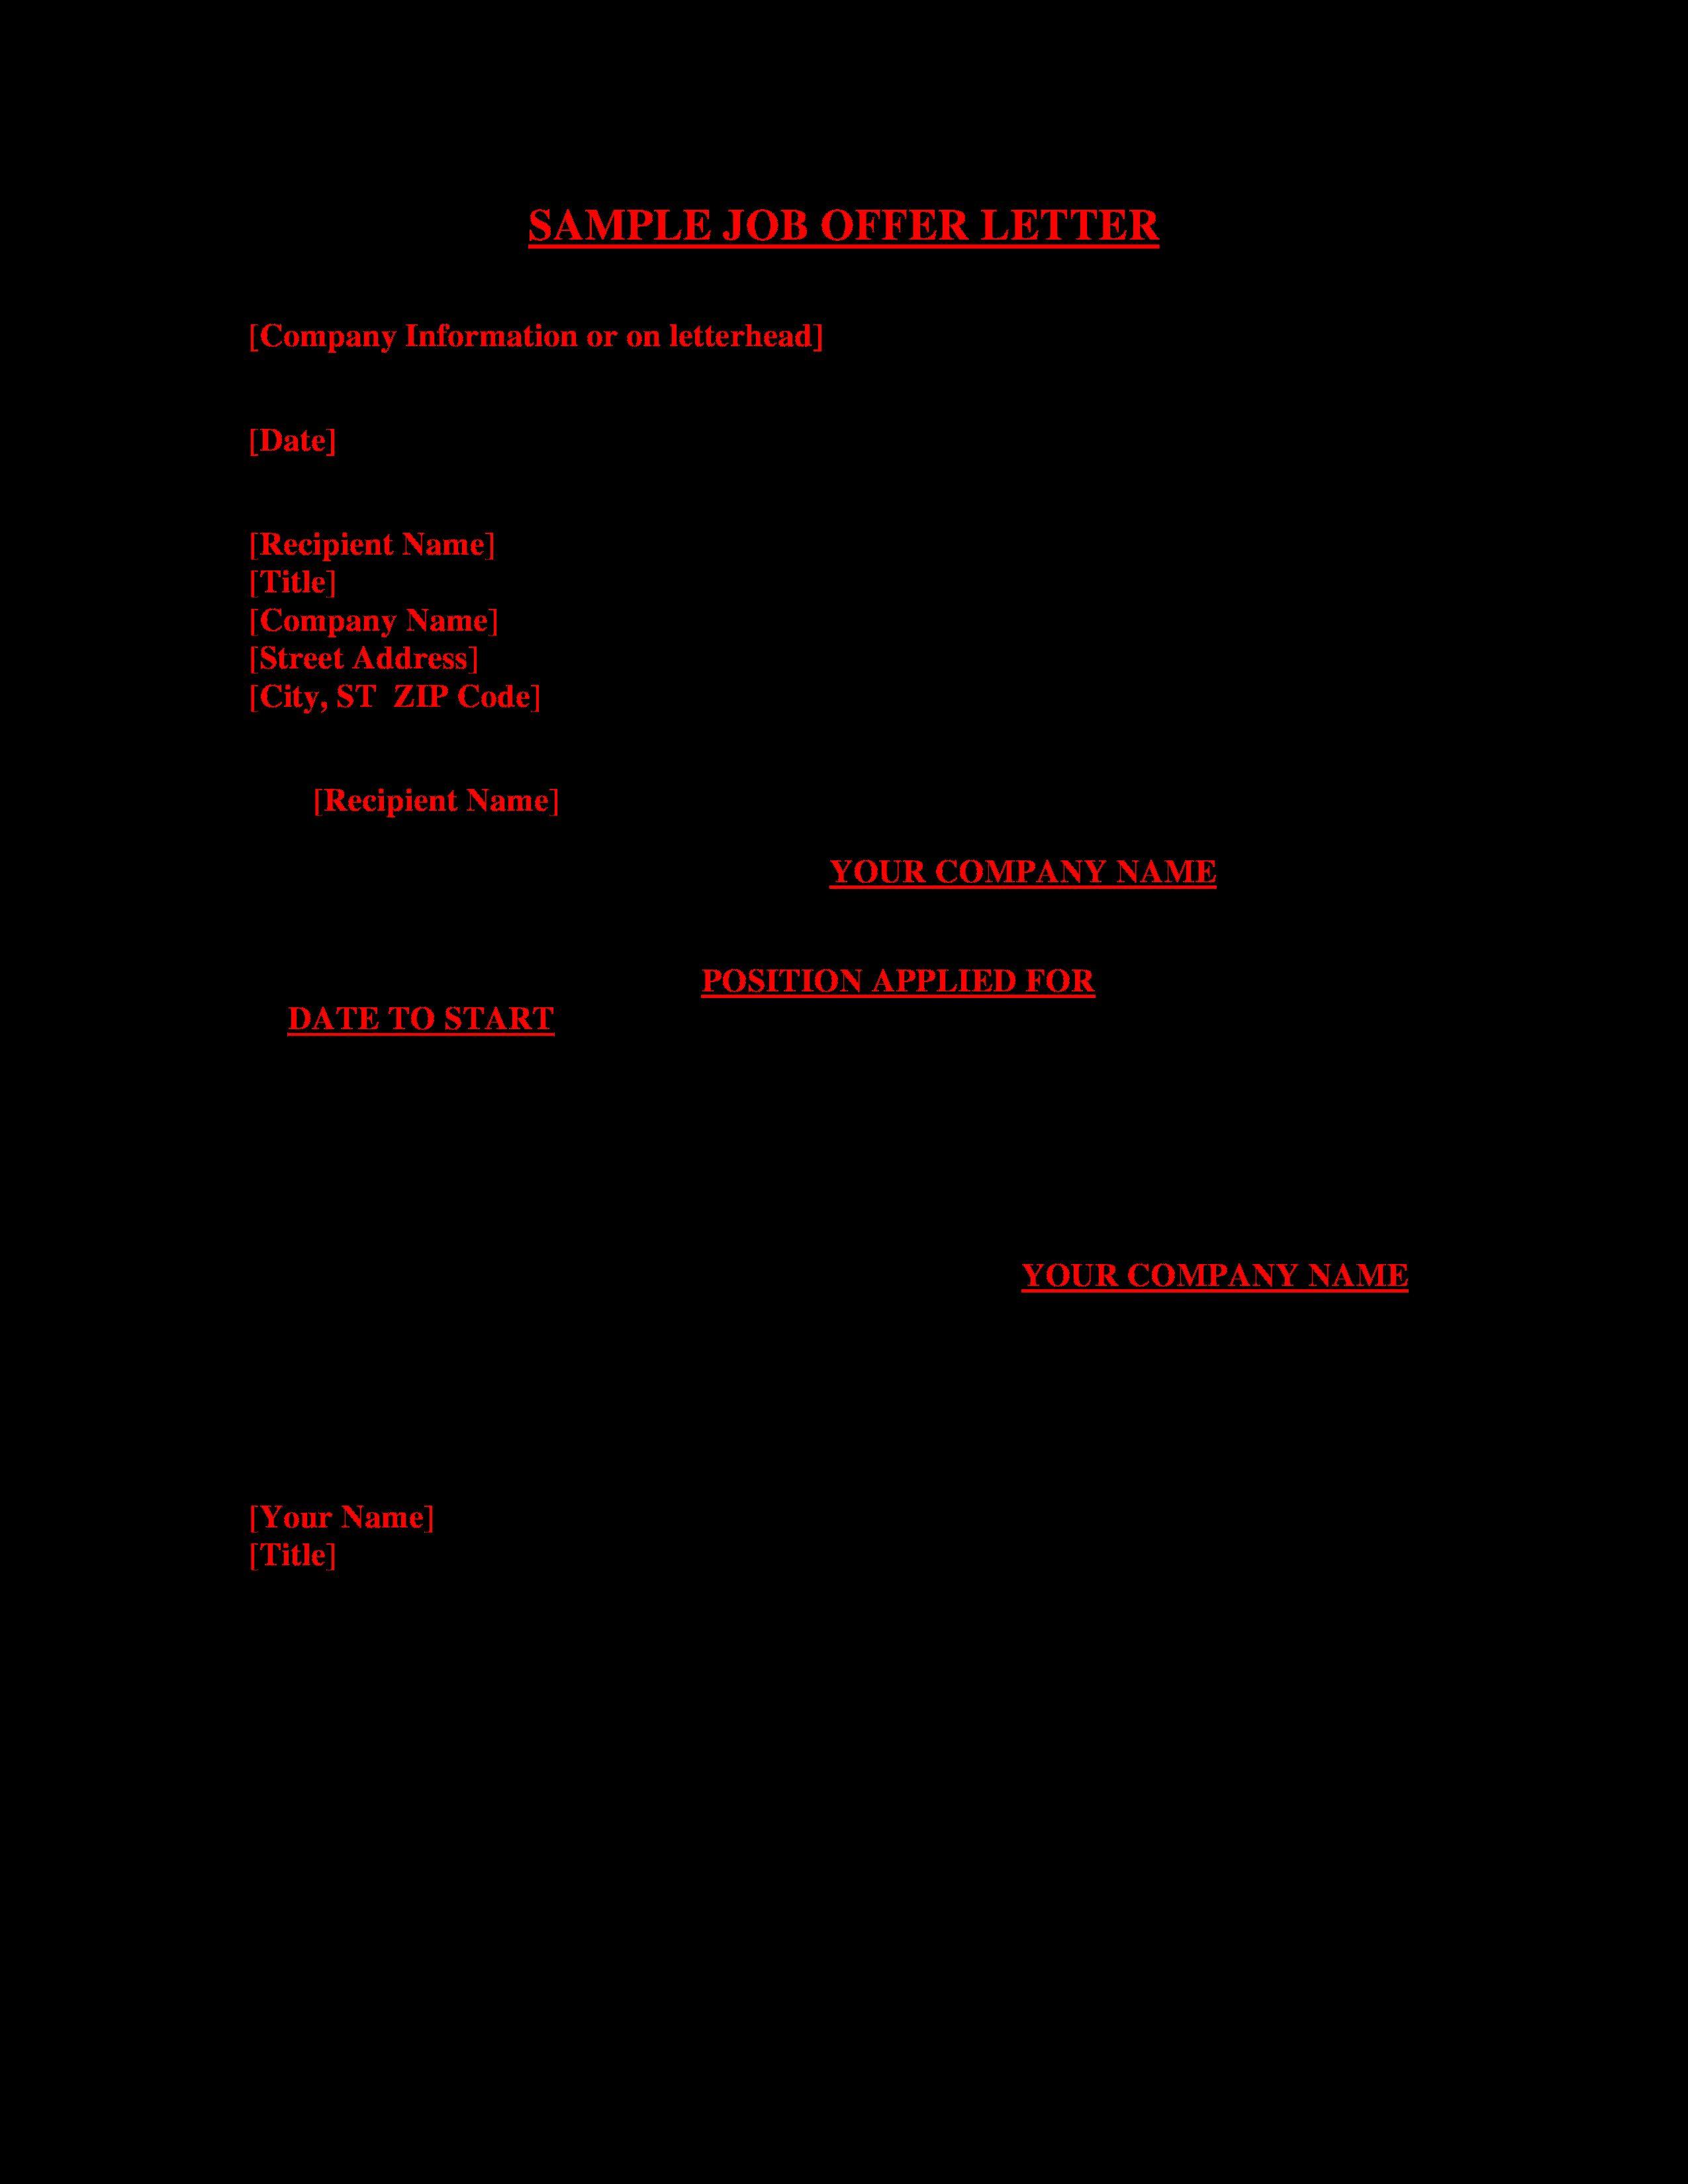 40 Job Offer Letter Example Business letter example